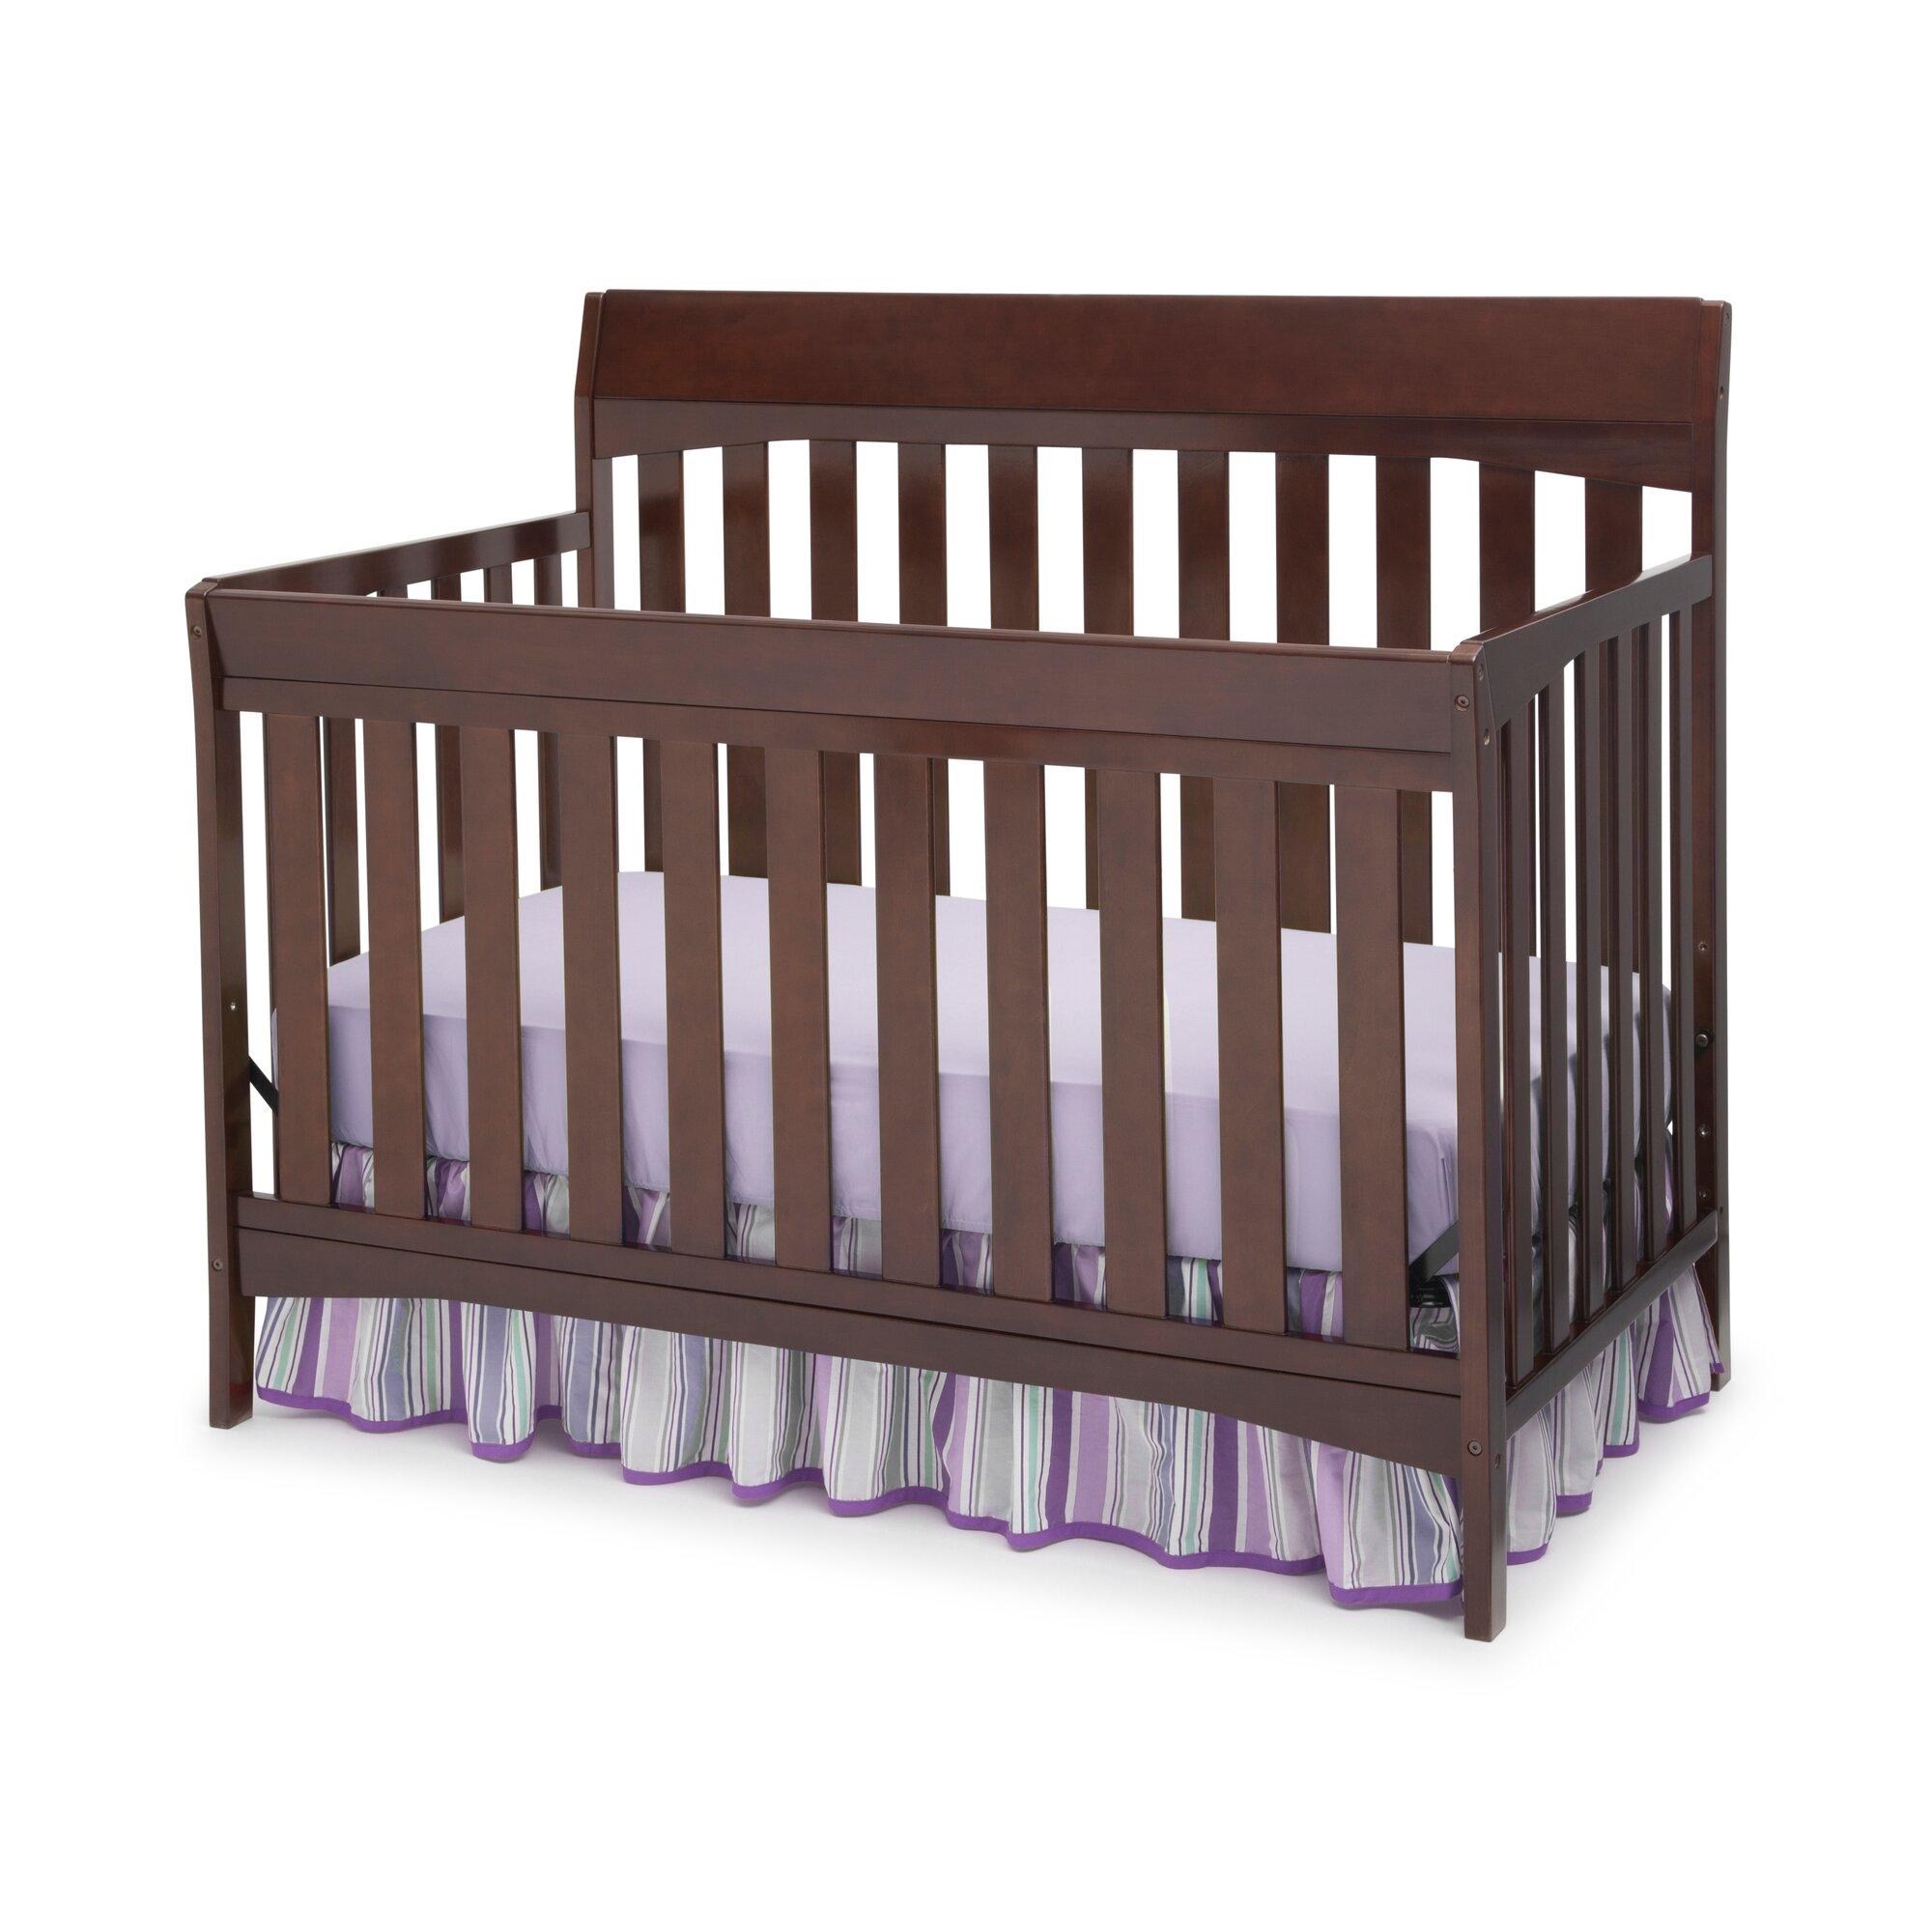 Child craft camden crib - Remi 4 In 1 Convertible Crib